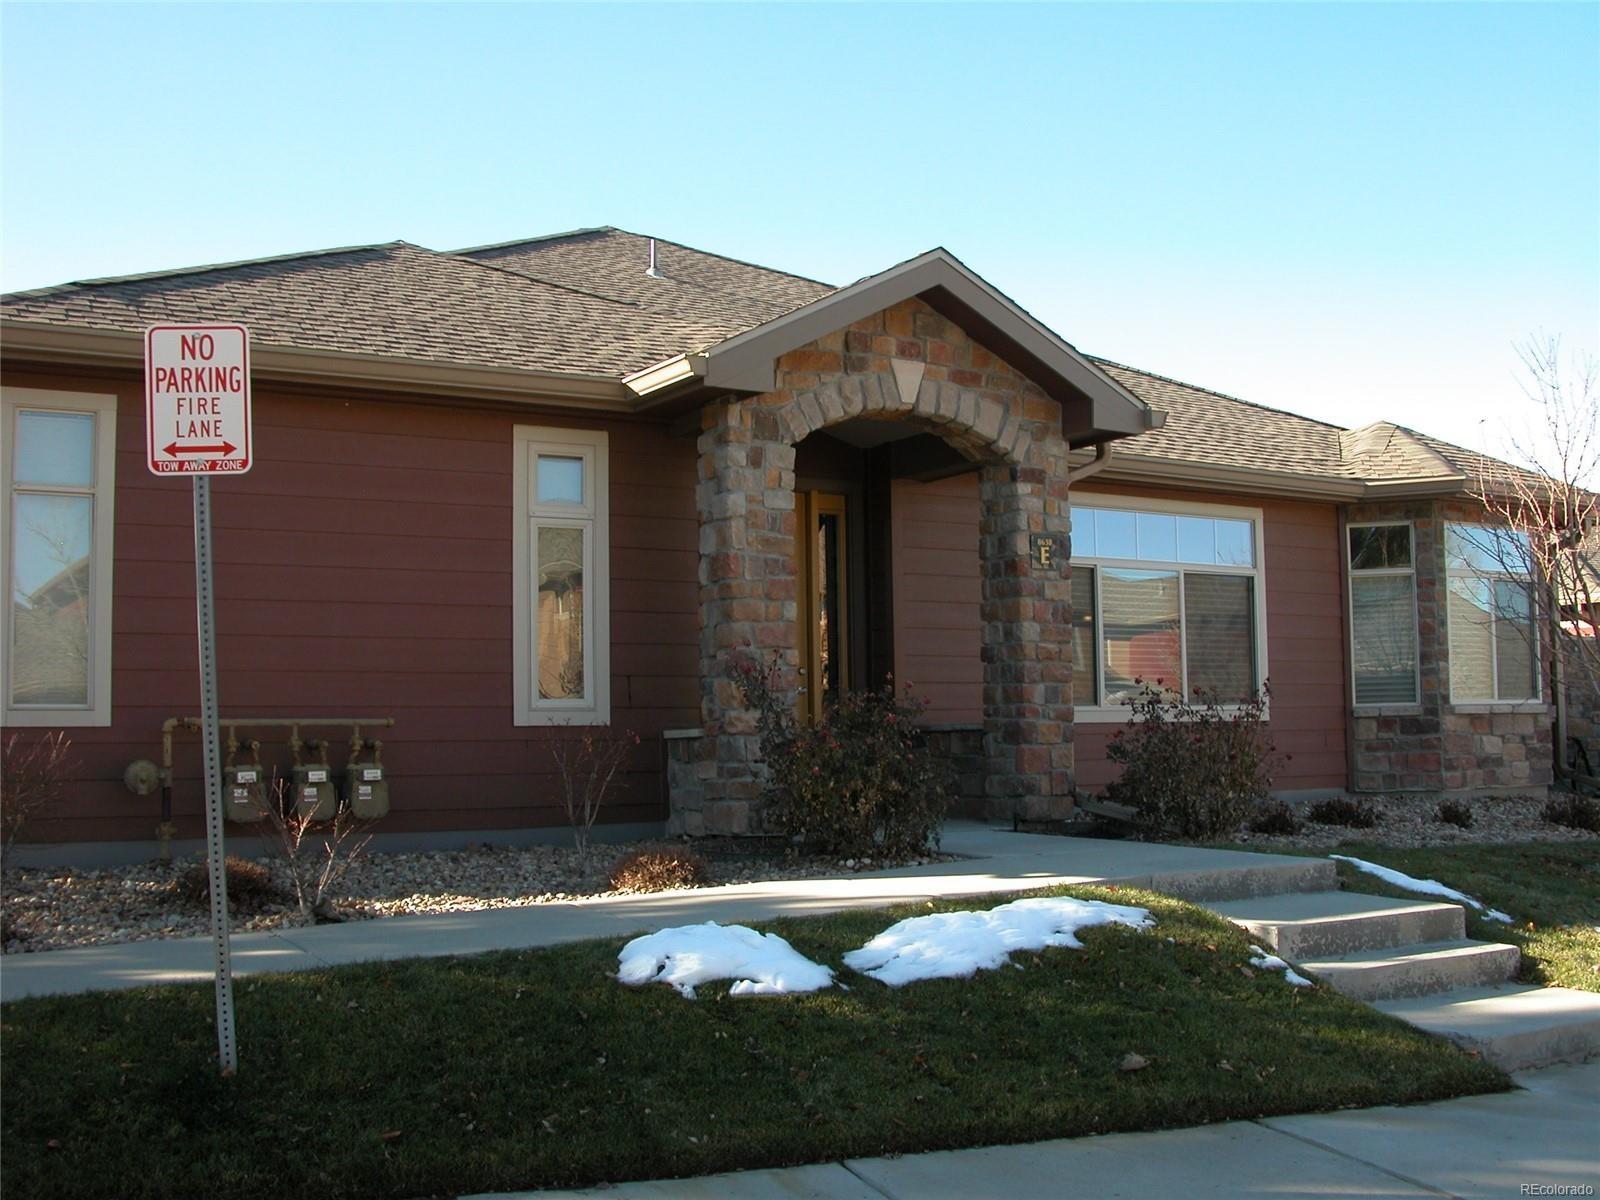 MLS# 3101866 - 8638  Gold Peak Drive, Highlands Ranch, CO 80130